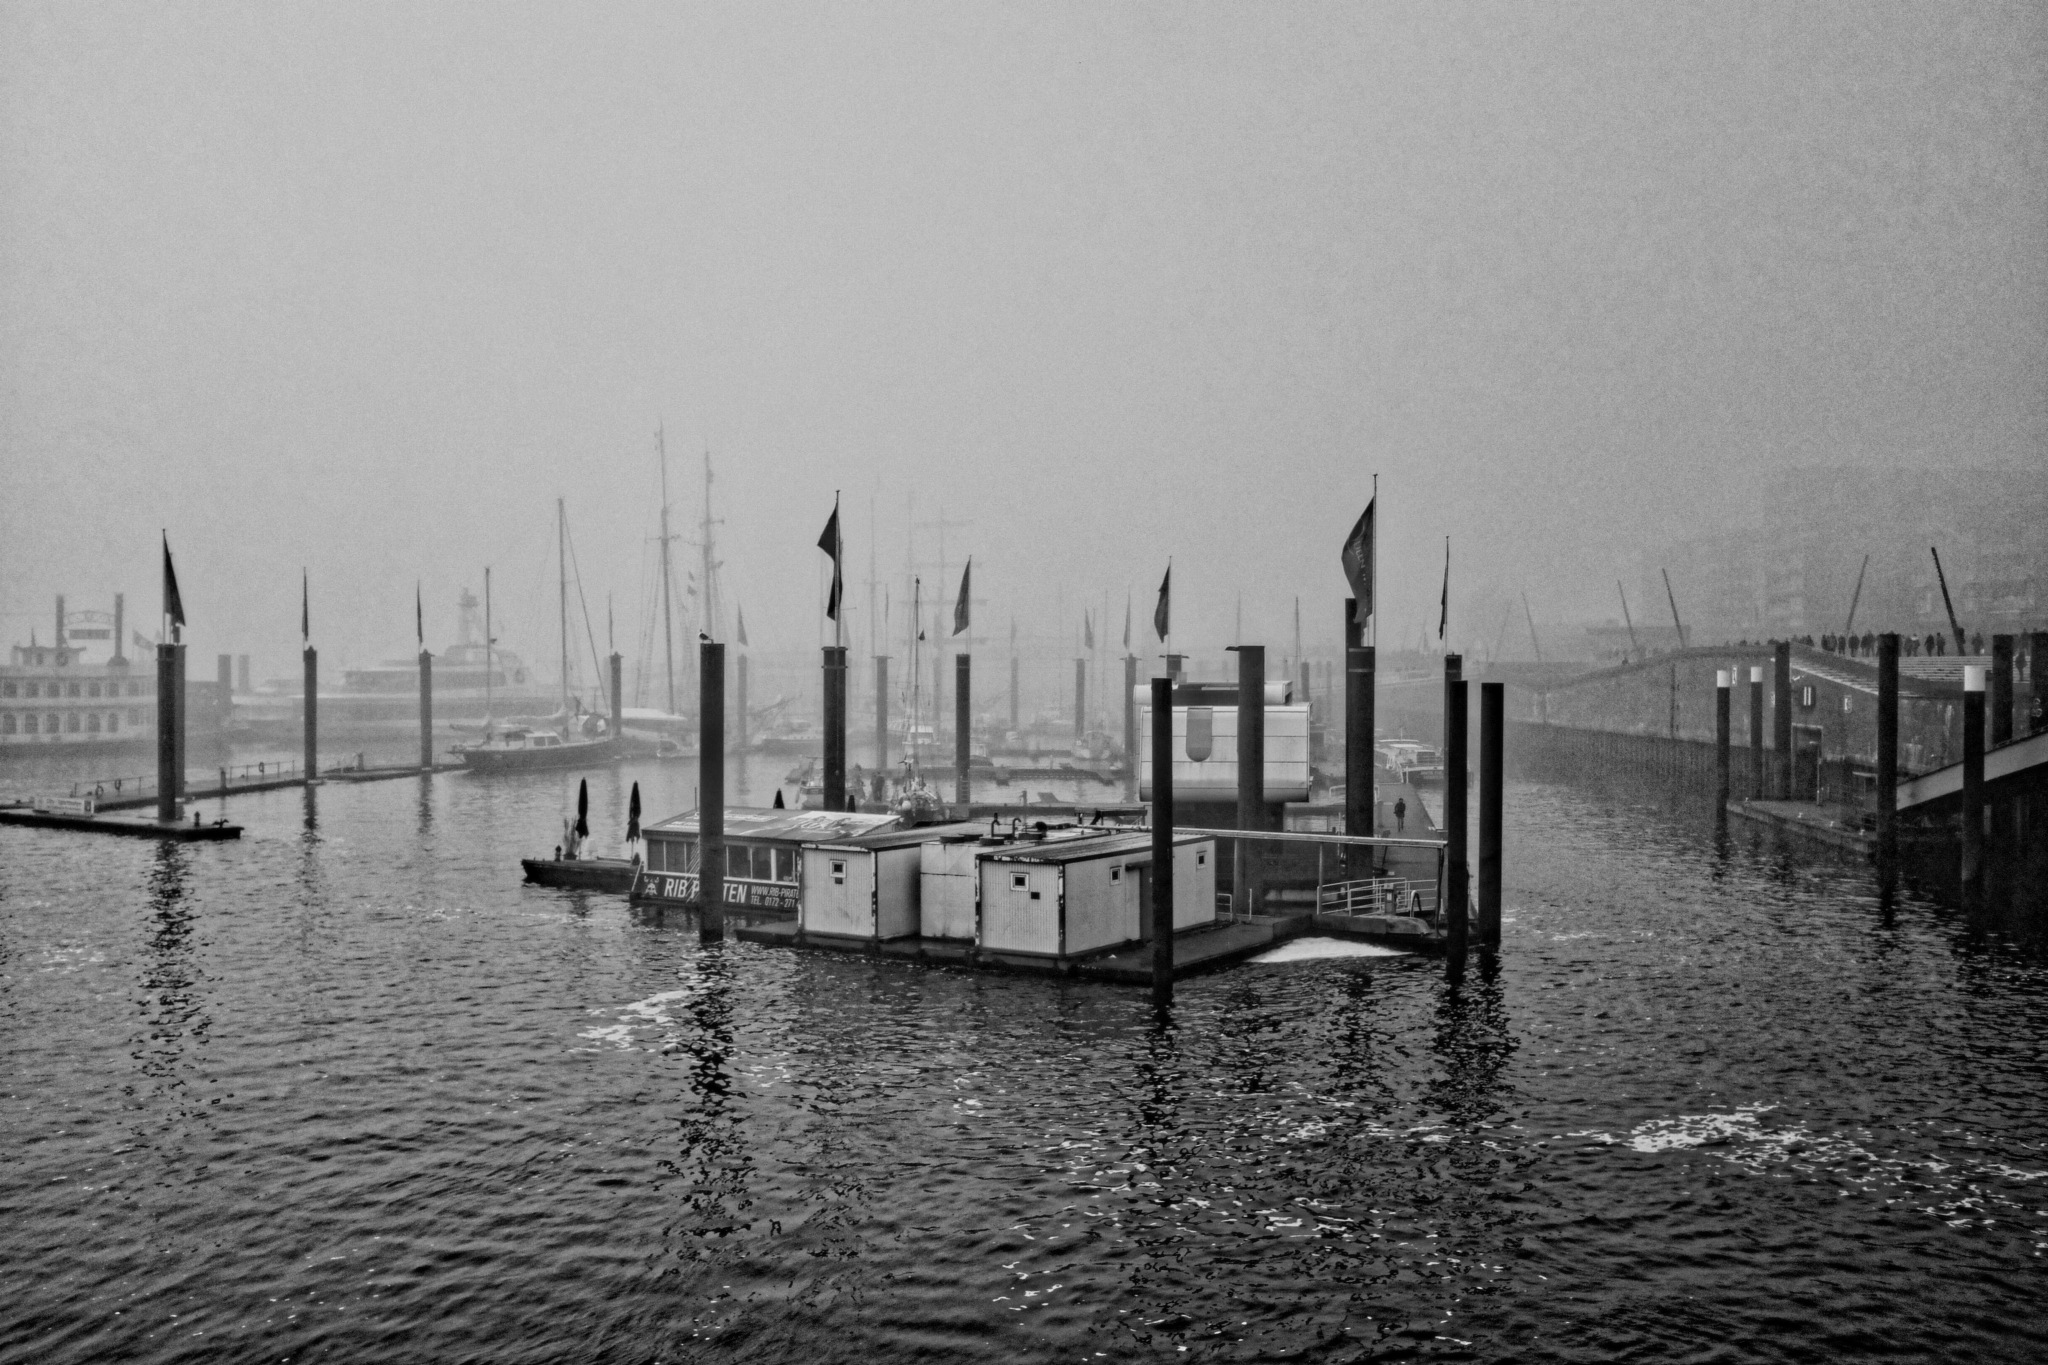 Foggy Days in Hamburg by peterkryzun